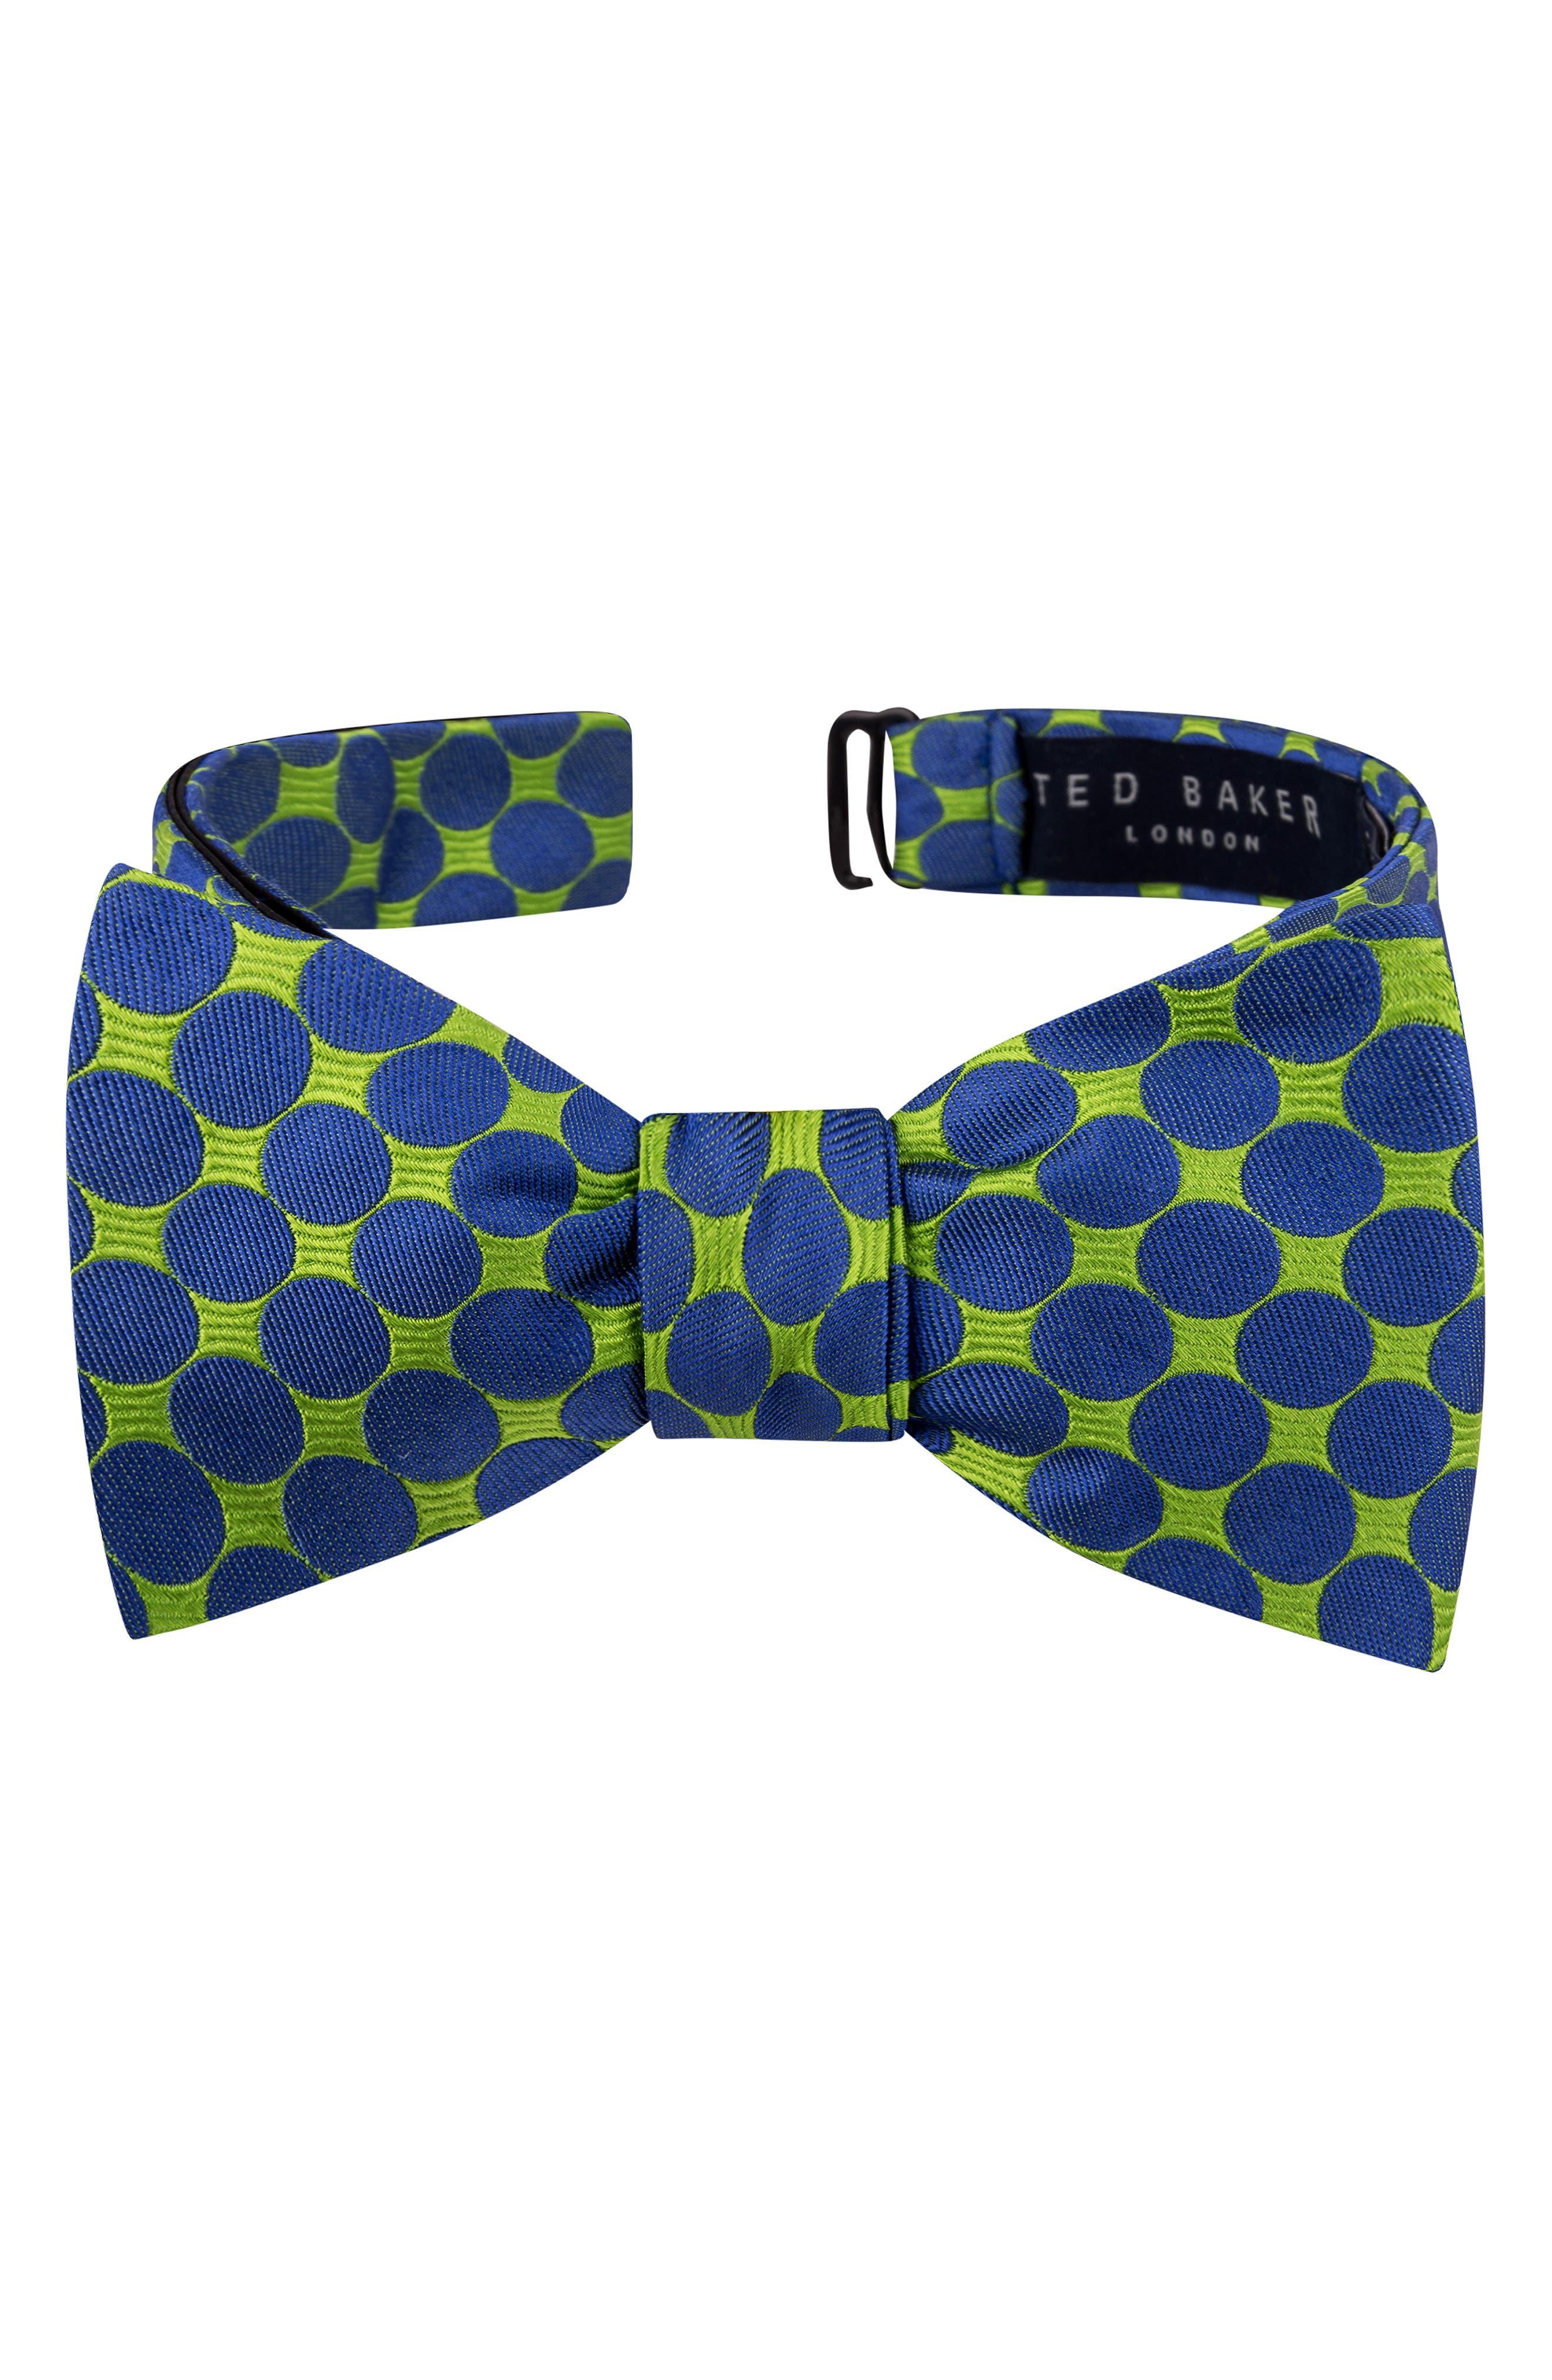 1950s Men's Ties – Vintage, Skinny, Knit, Pattern Neckties Mens Ted Baker London Circles Silk Bow Tie Size Regular - Green $59.50 AT vintagedancer.com